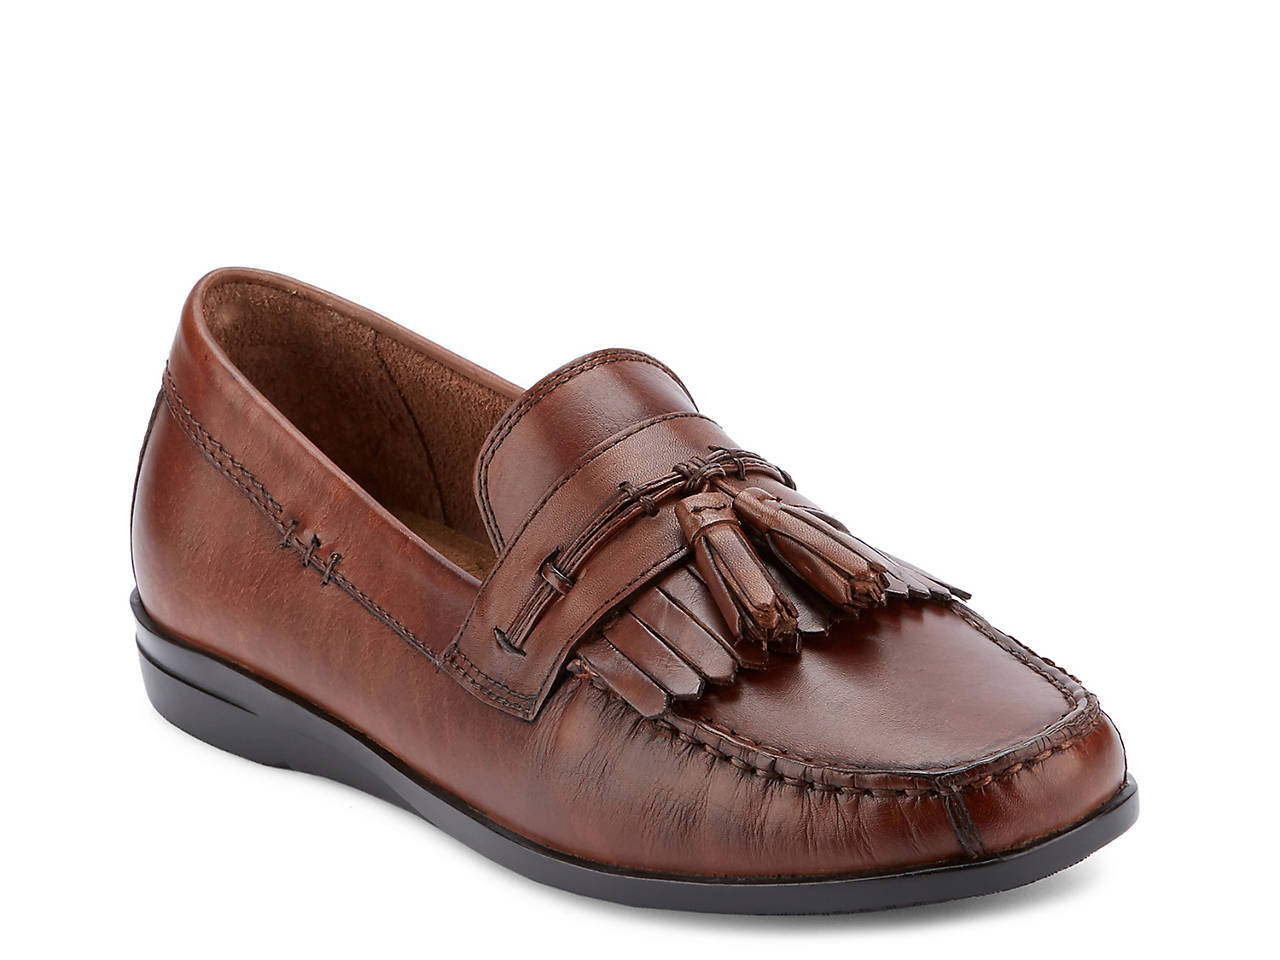 Dockers® Freestone Shoes t9CMqw3S4